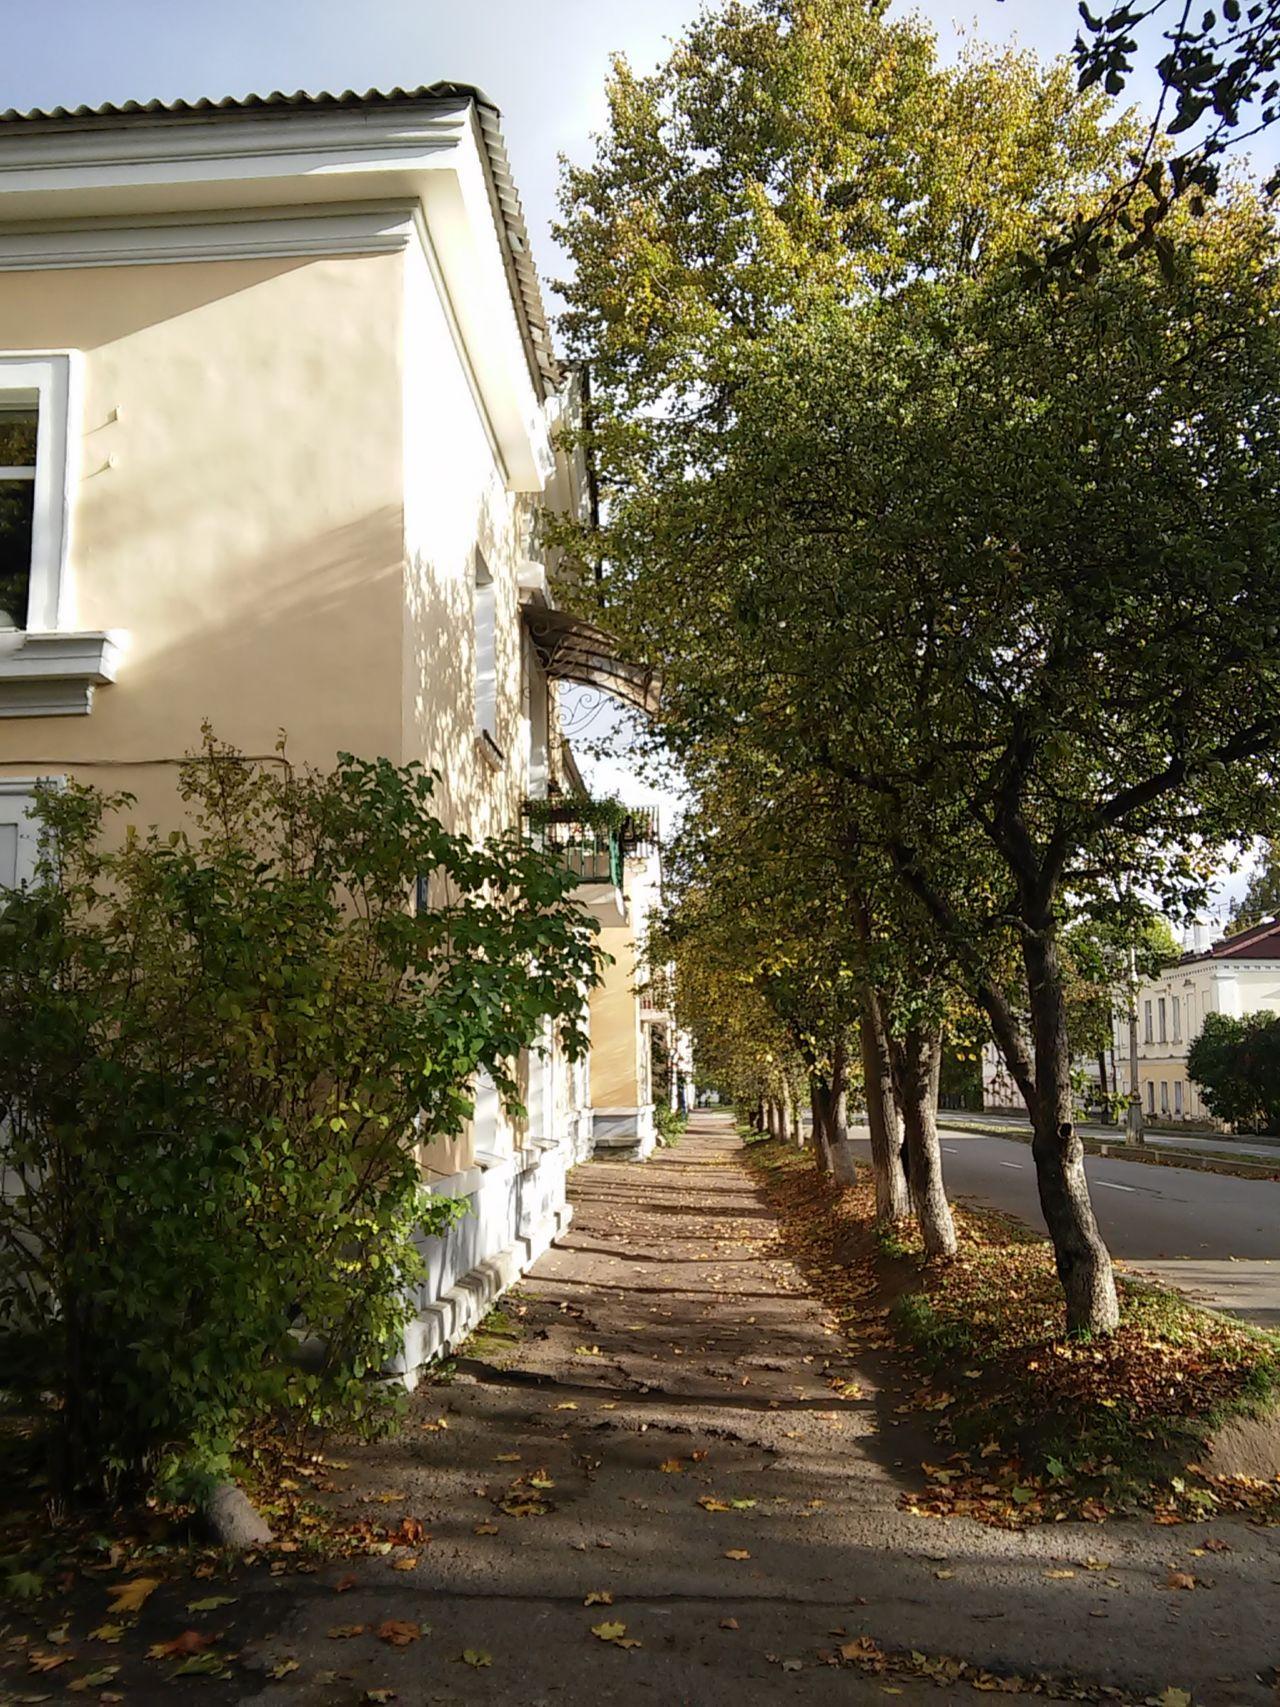 Architecture Outdoors Sun The Way Forward Tree Velikiy Novgorod Walkway